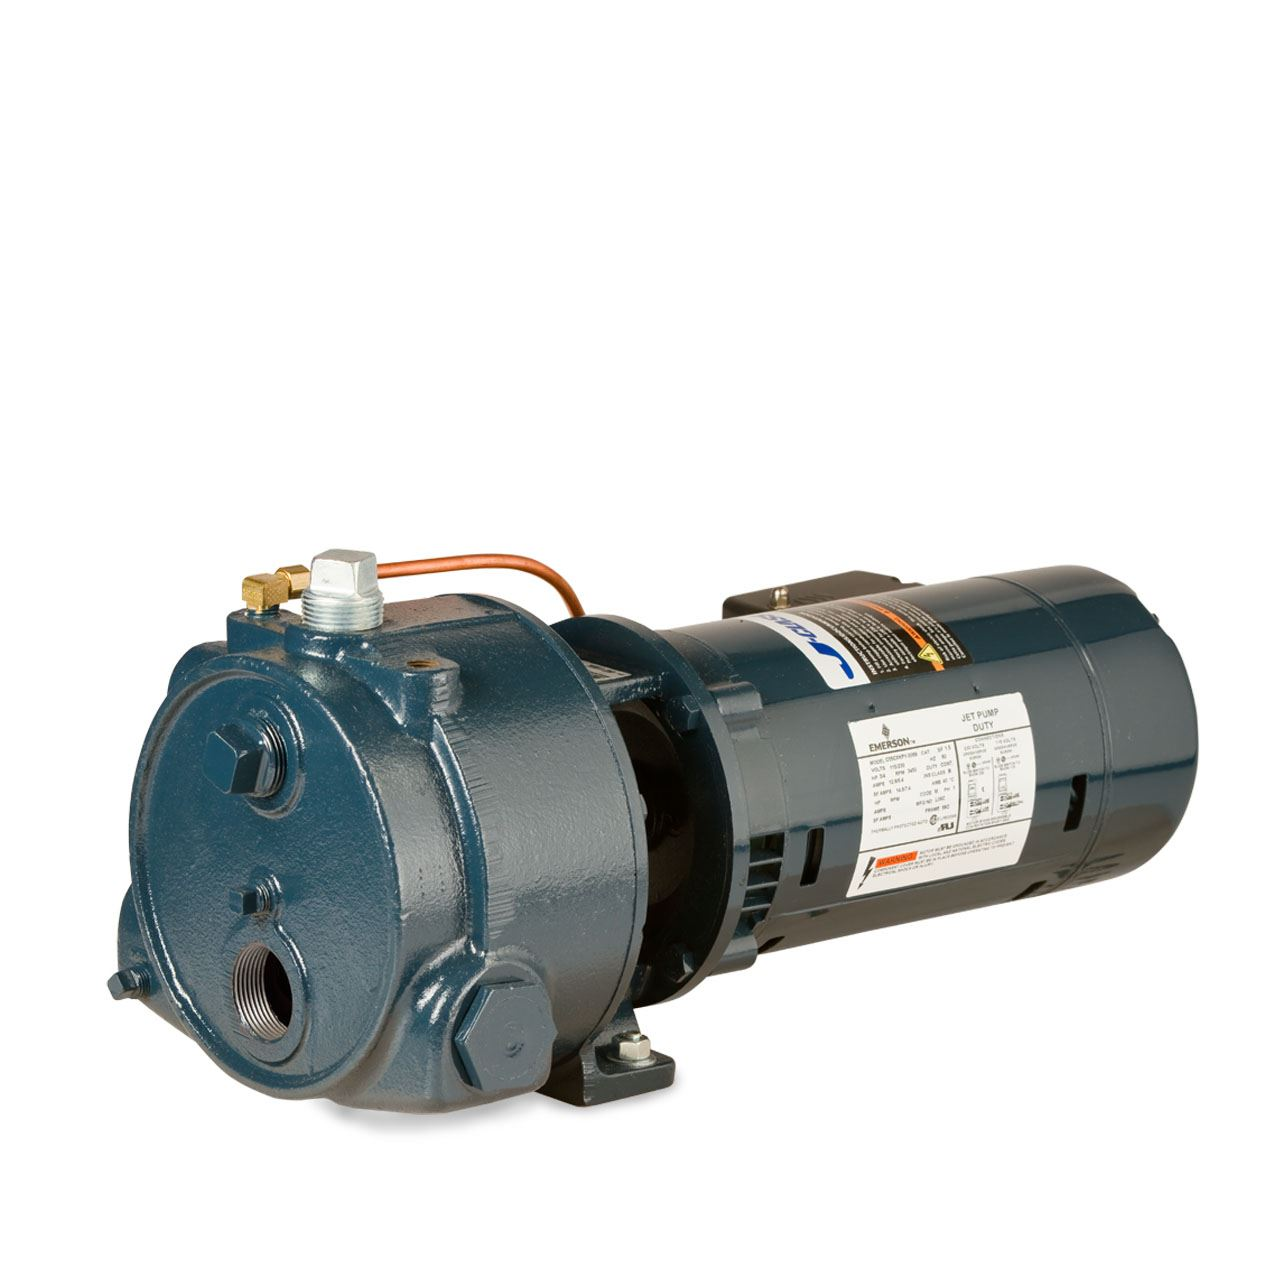 medium resolution of franklin electric franklin electric jrm07ci c 91110882 rm2 series single phase 115v motor diagrams 115 230